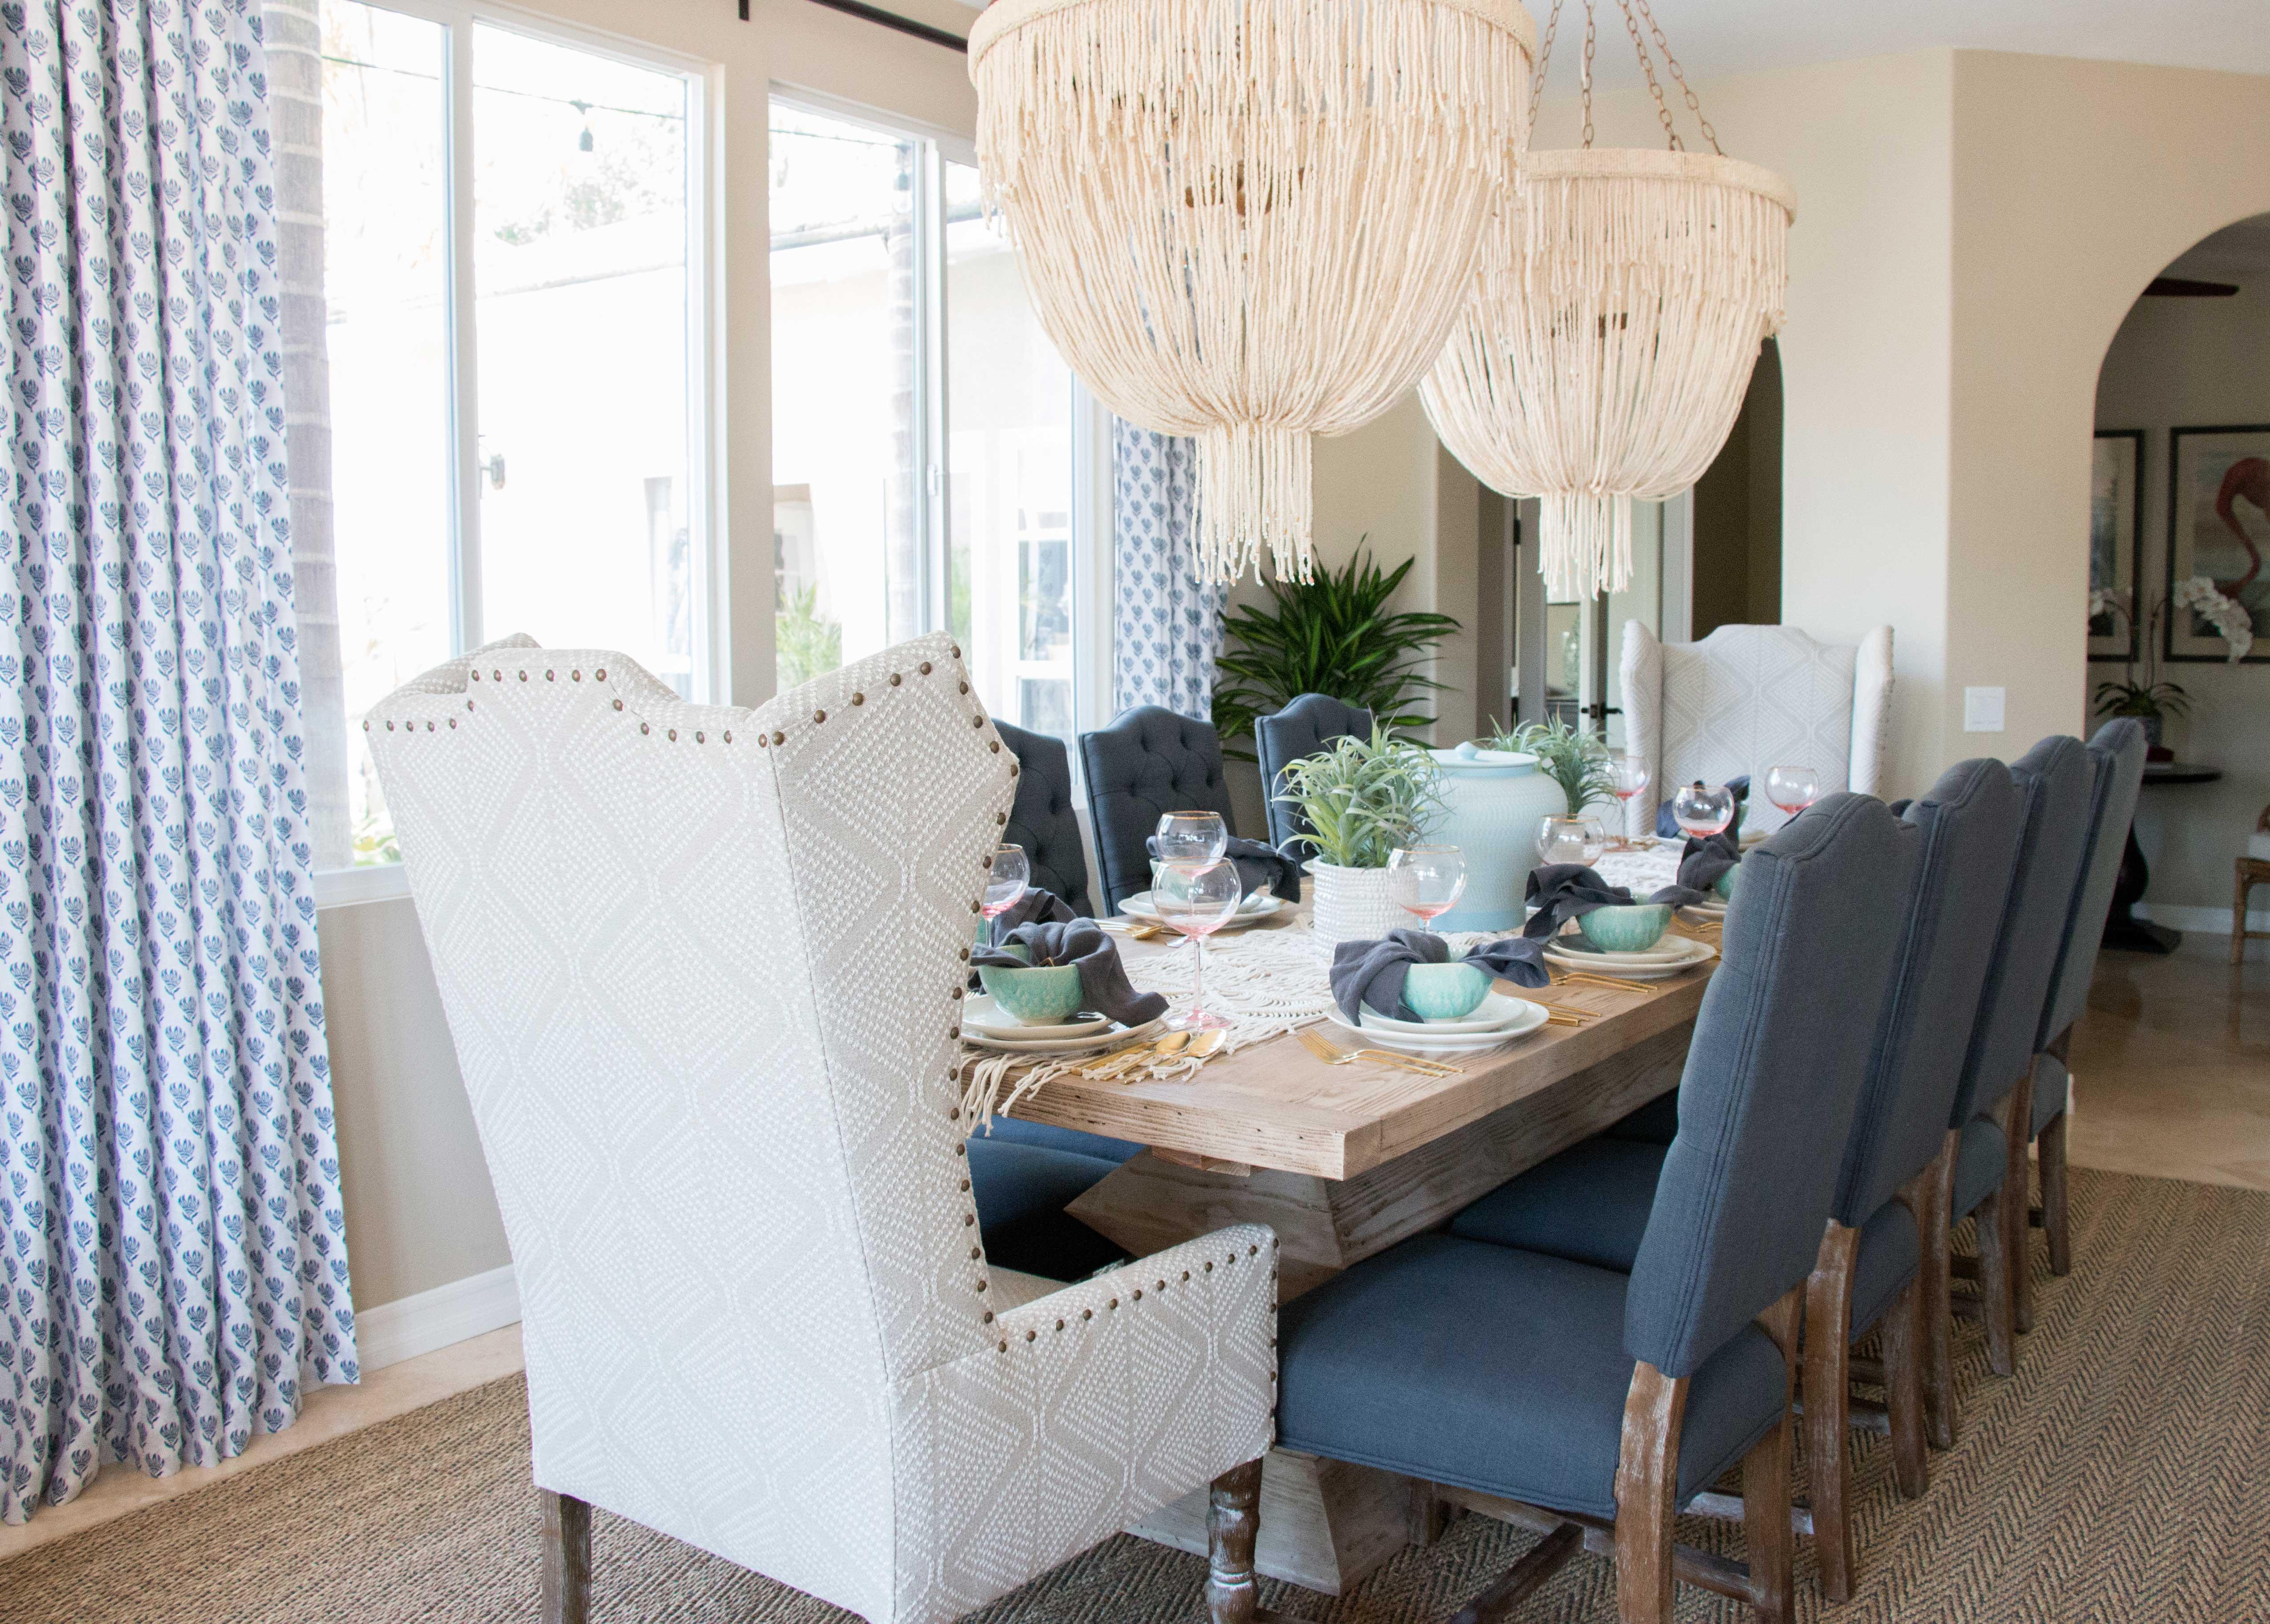 blackband_design_dining_table_setup_5